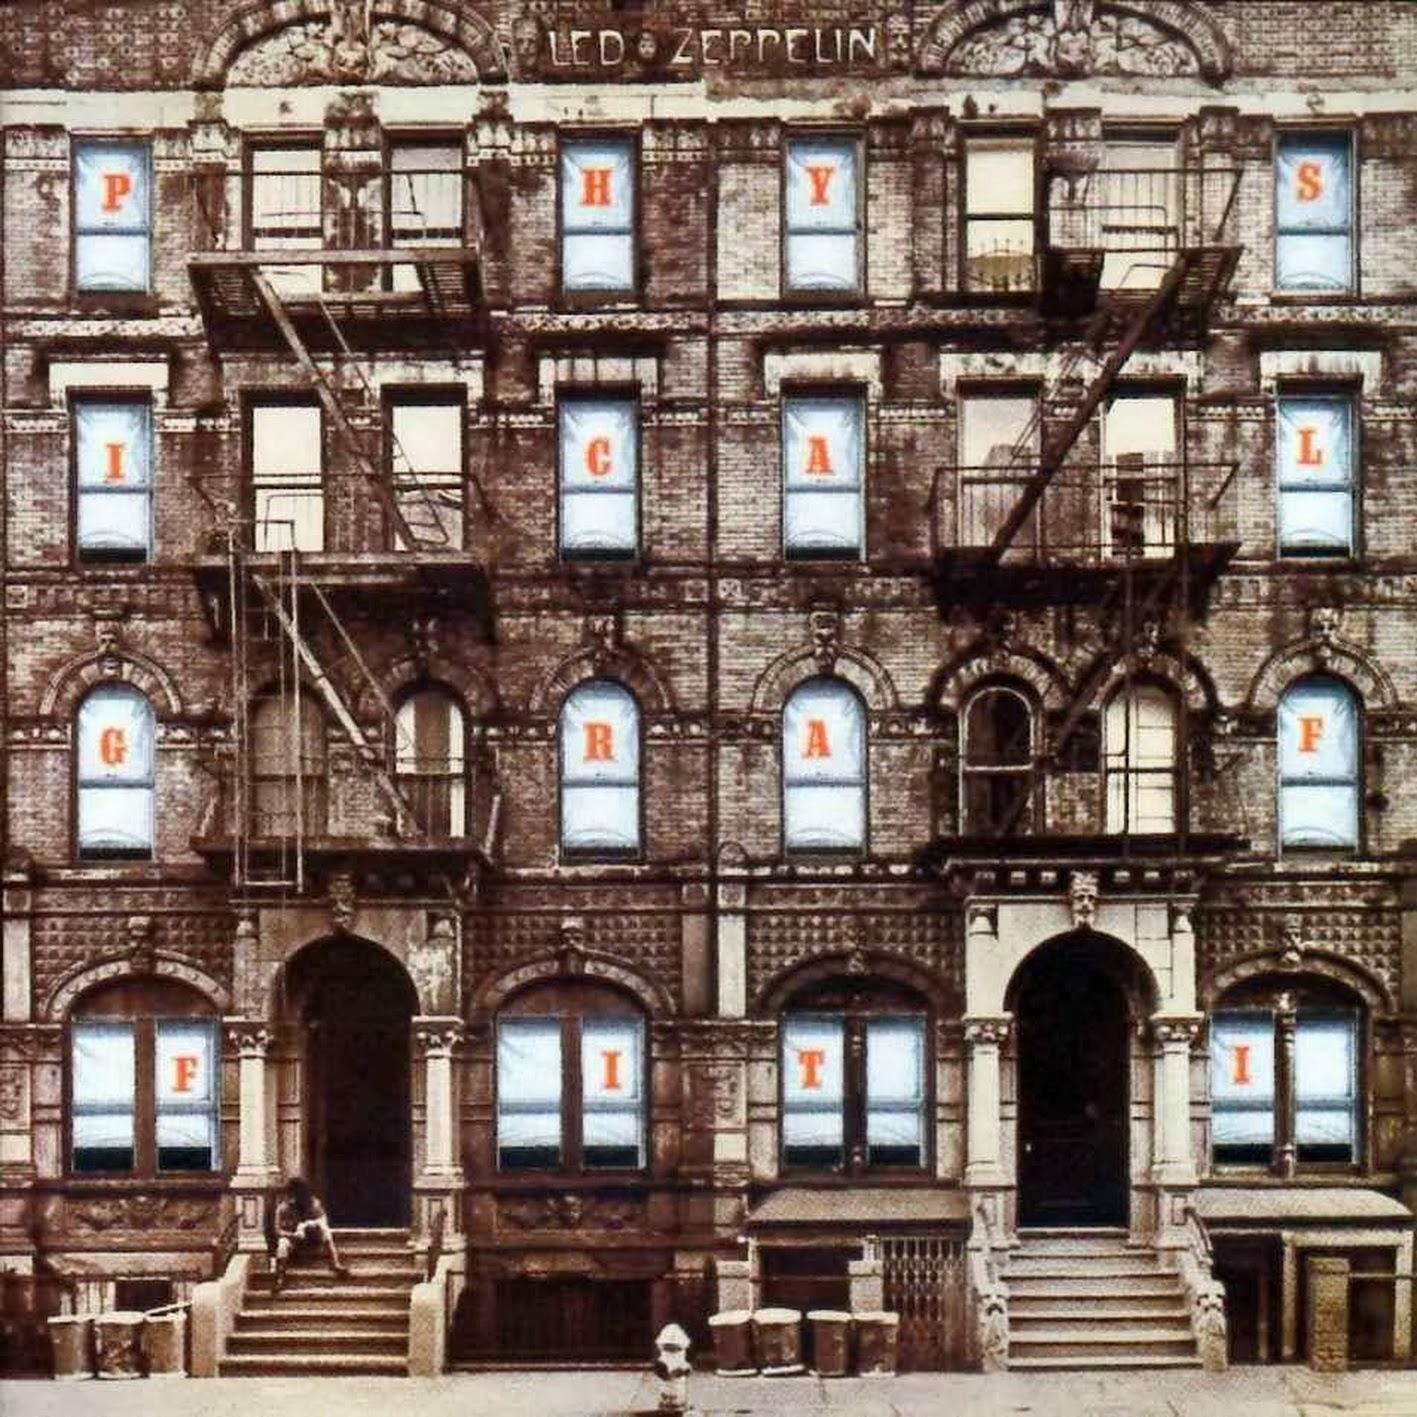 Parecidos Razonables - Página 4 Led_Zeppelin_1975_Physical_Graffiti